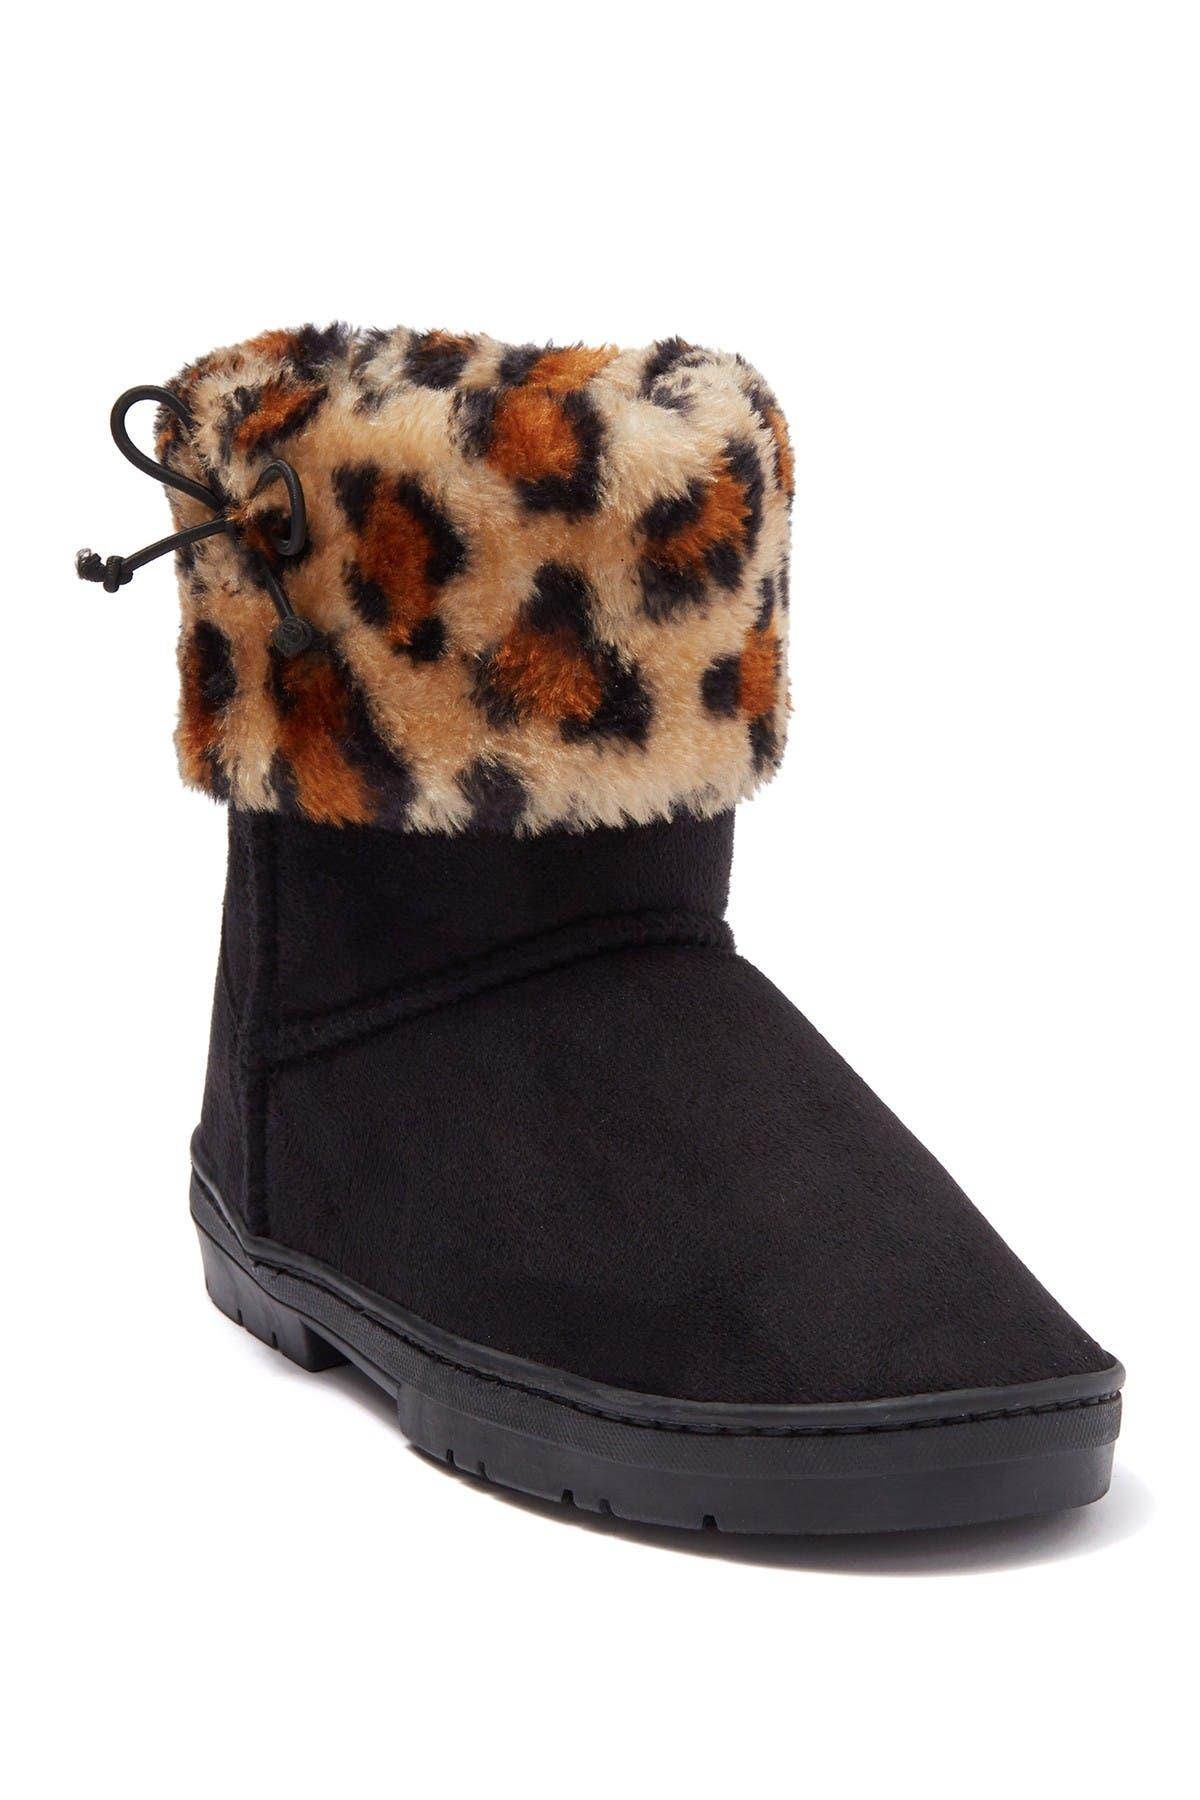 Bebe Winter Faux Fur Boots